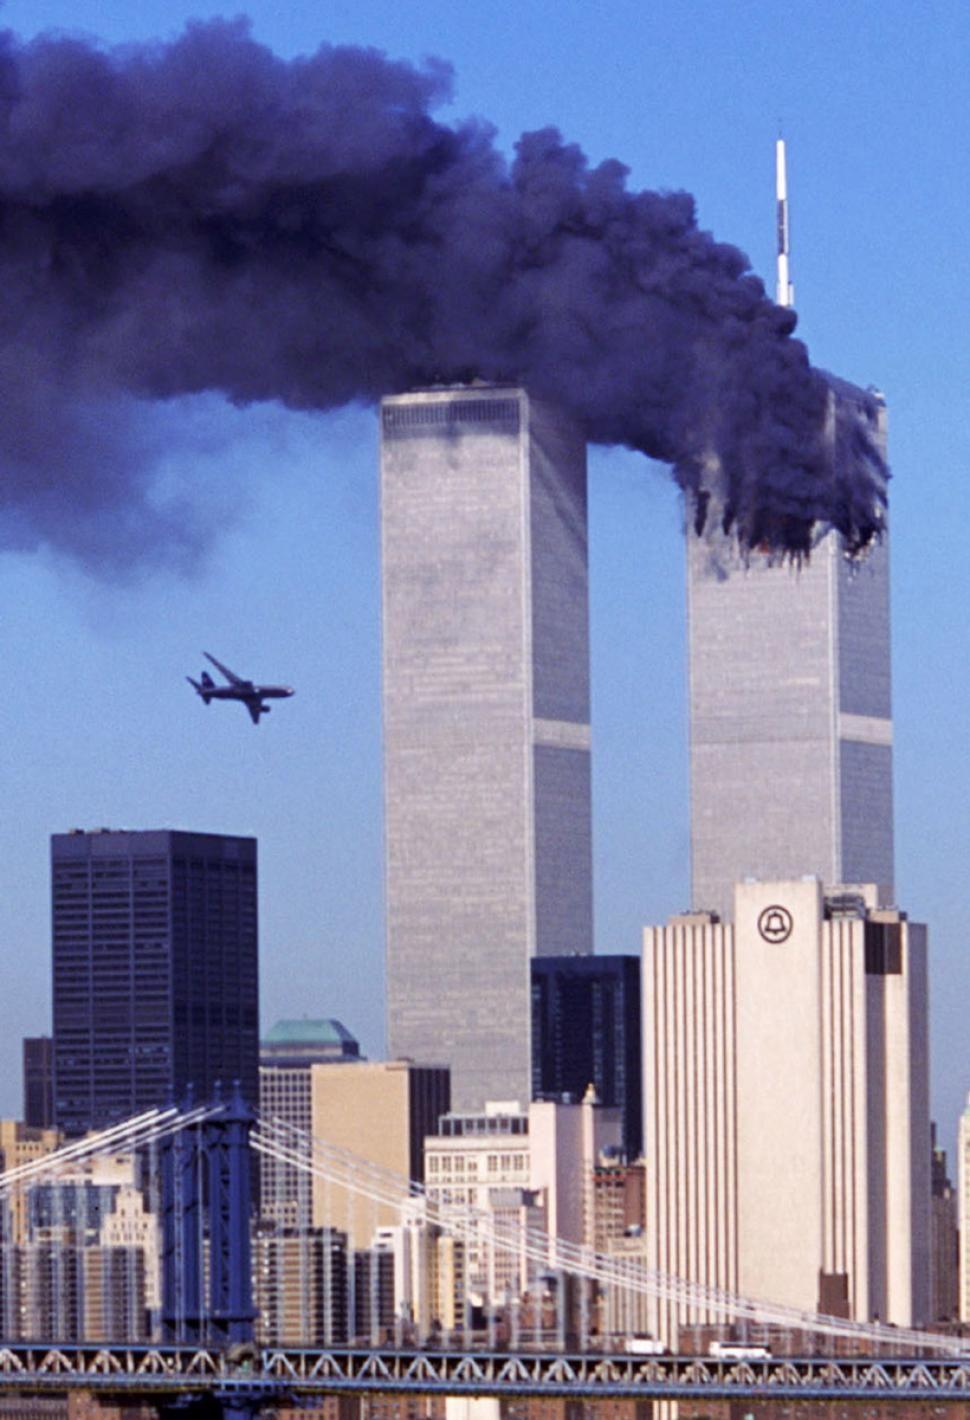 14 Bad ideas | batman christian bale, remembering september 11th, 911 never forget